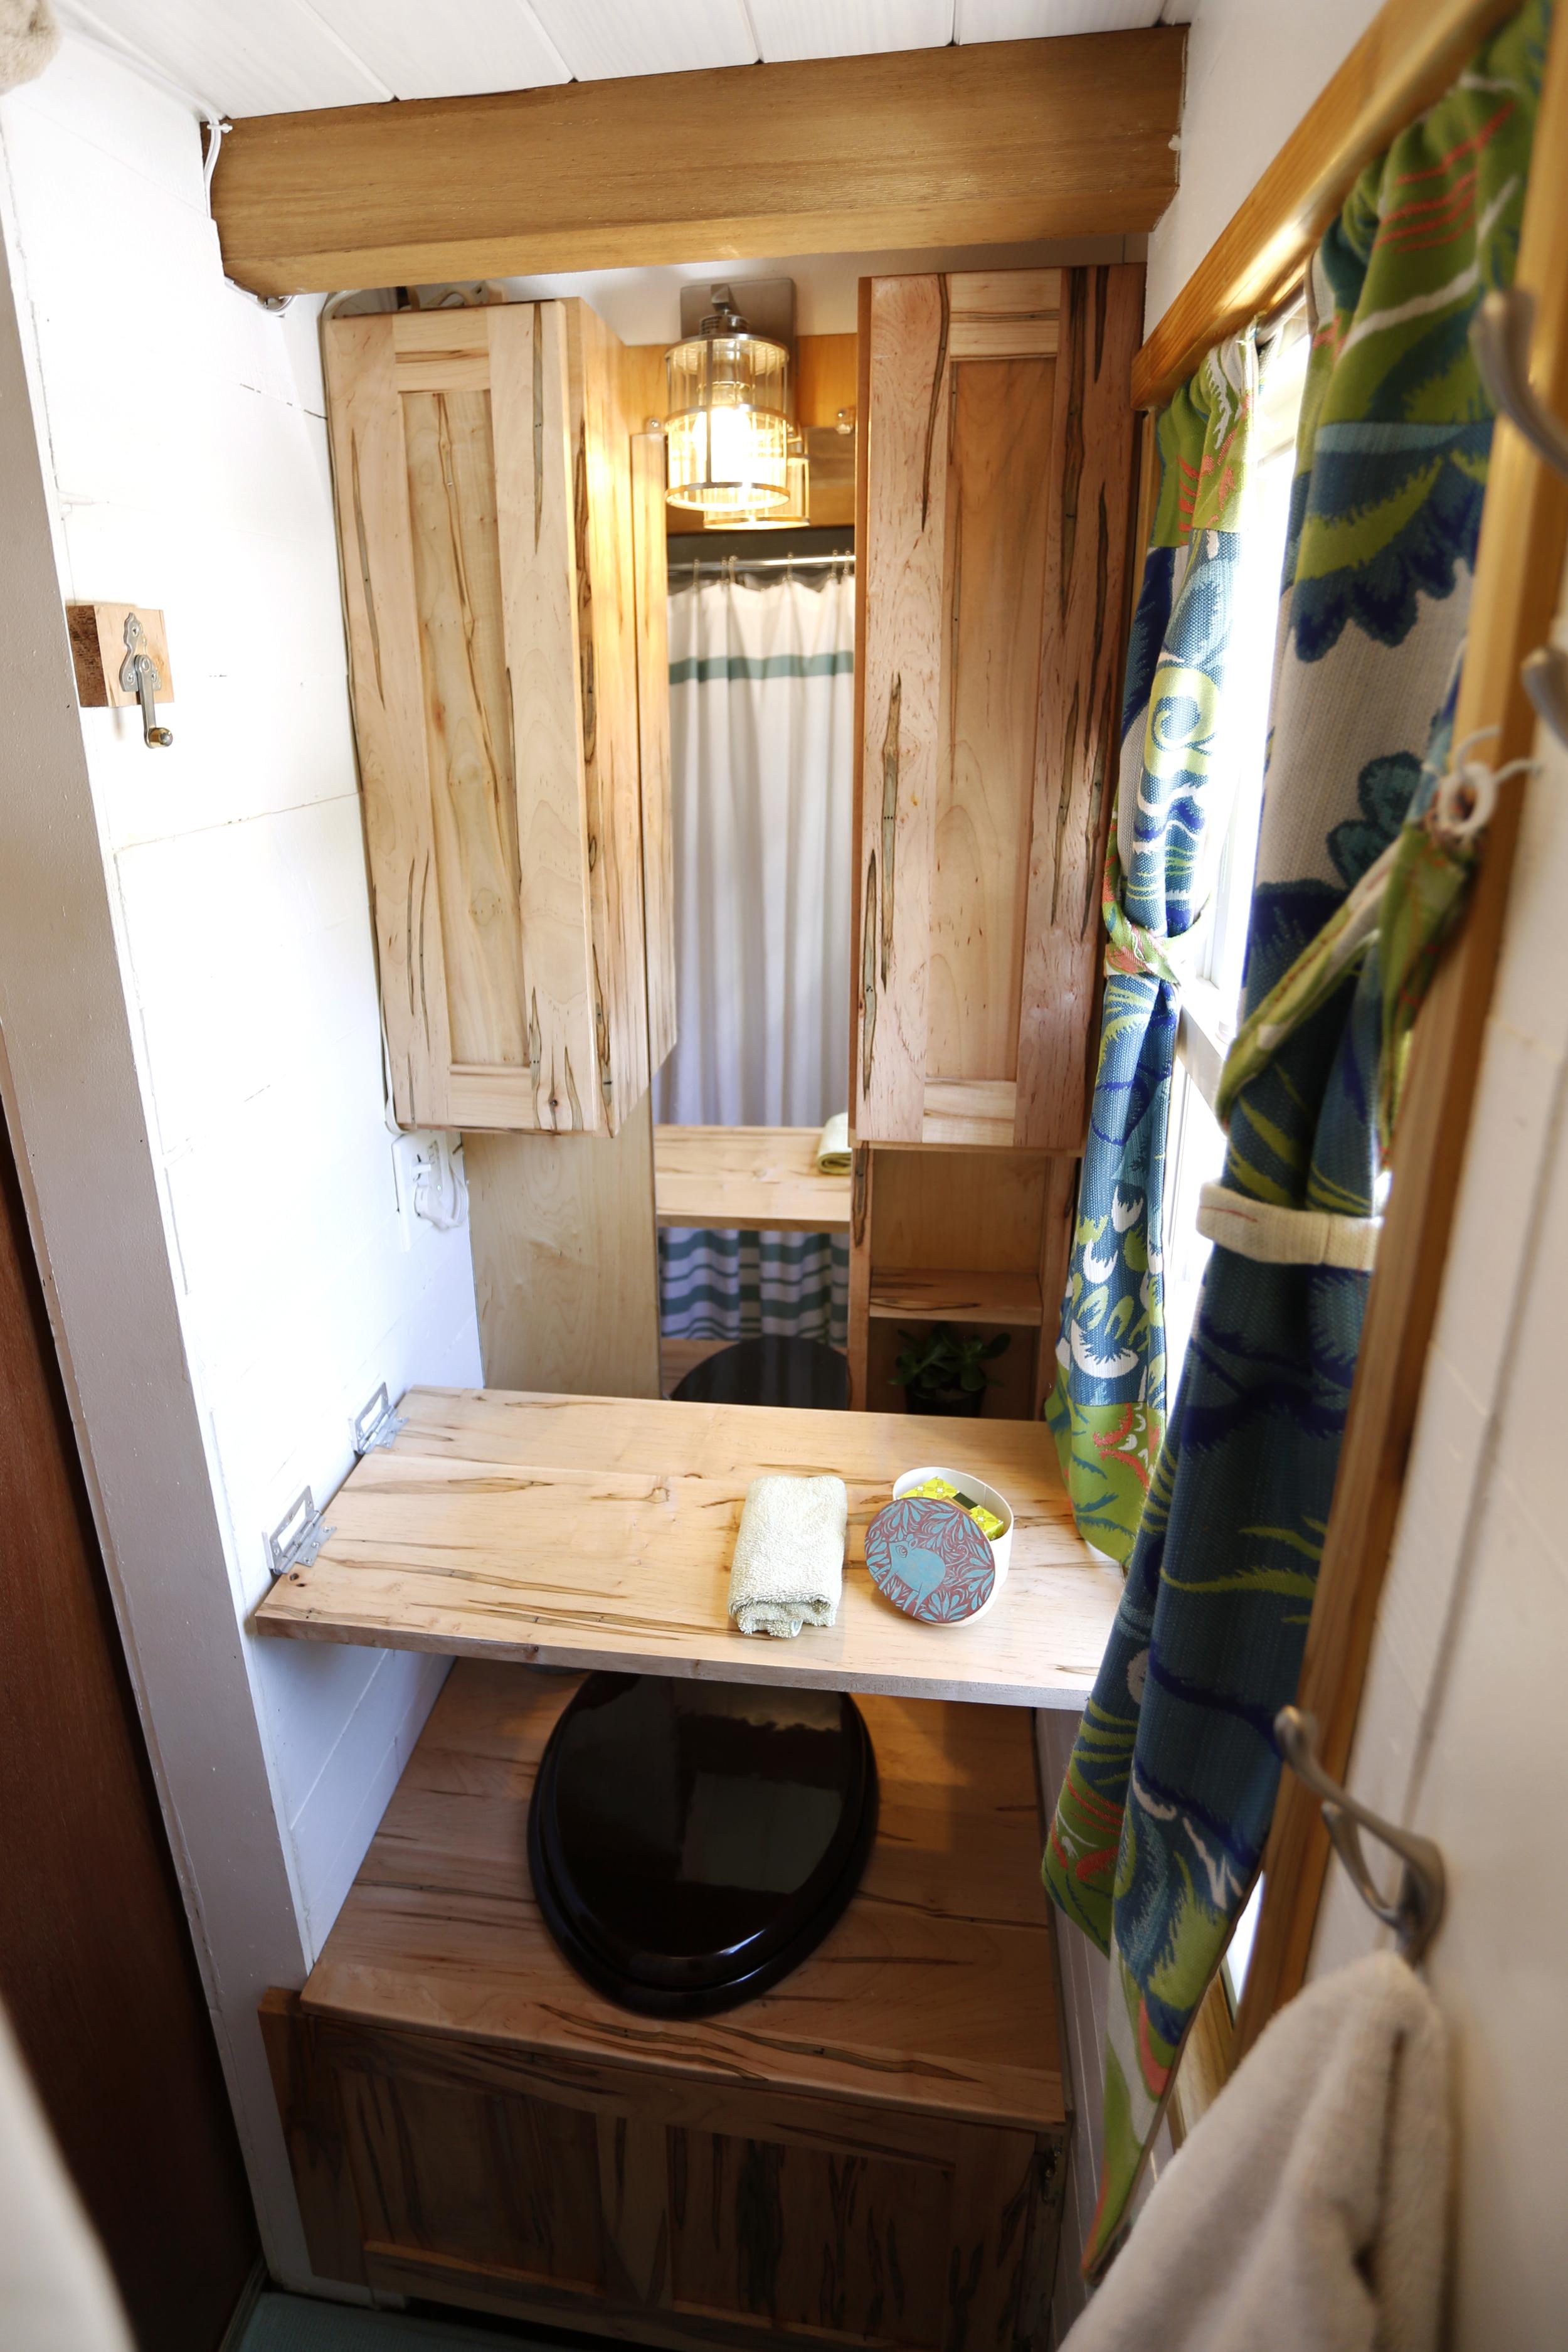 toilet_shelf_down.jpg